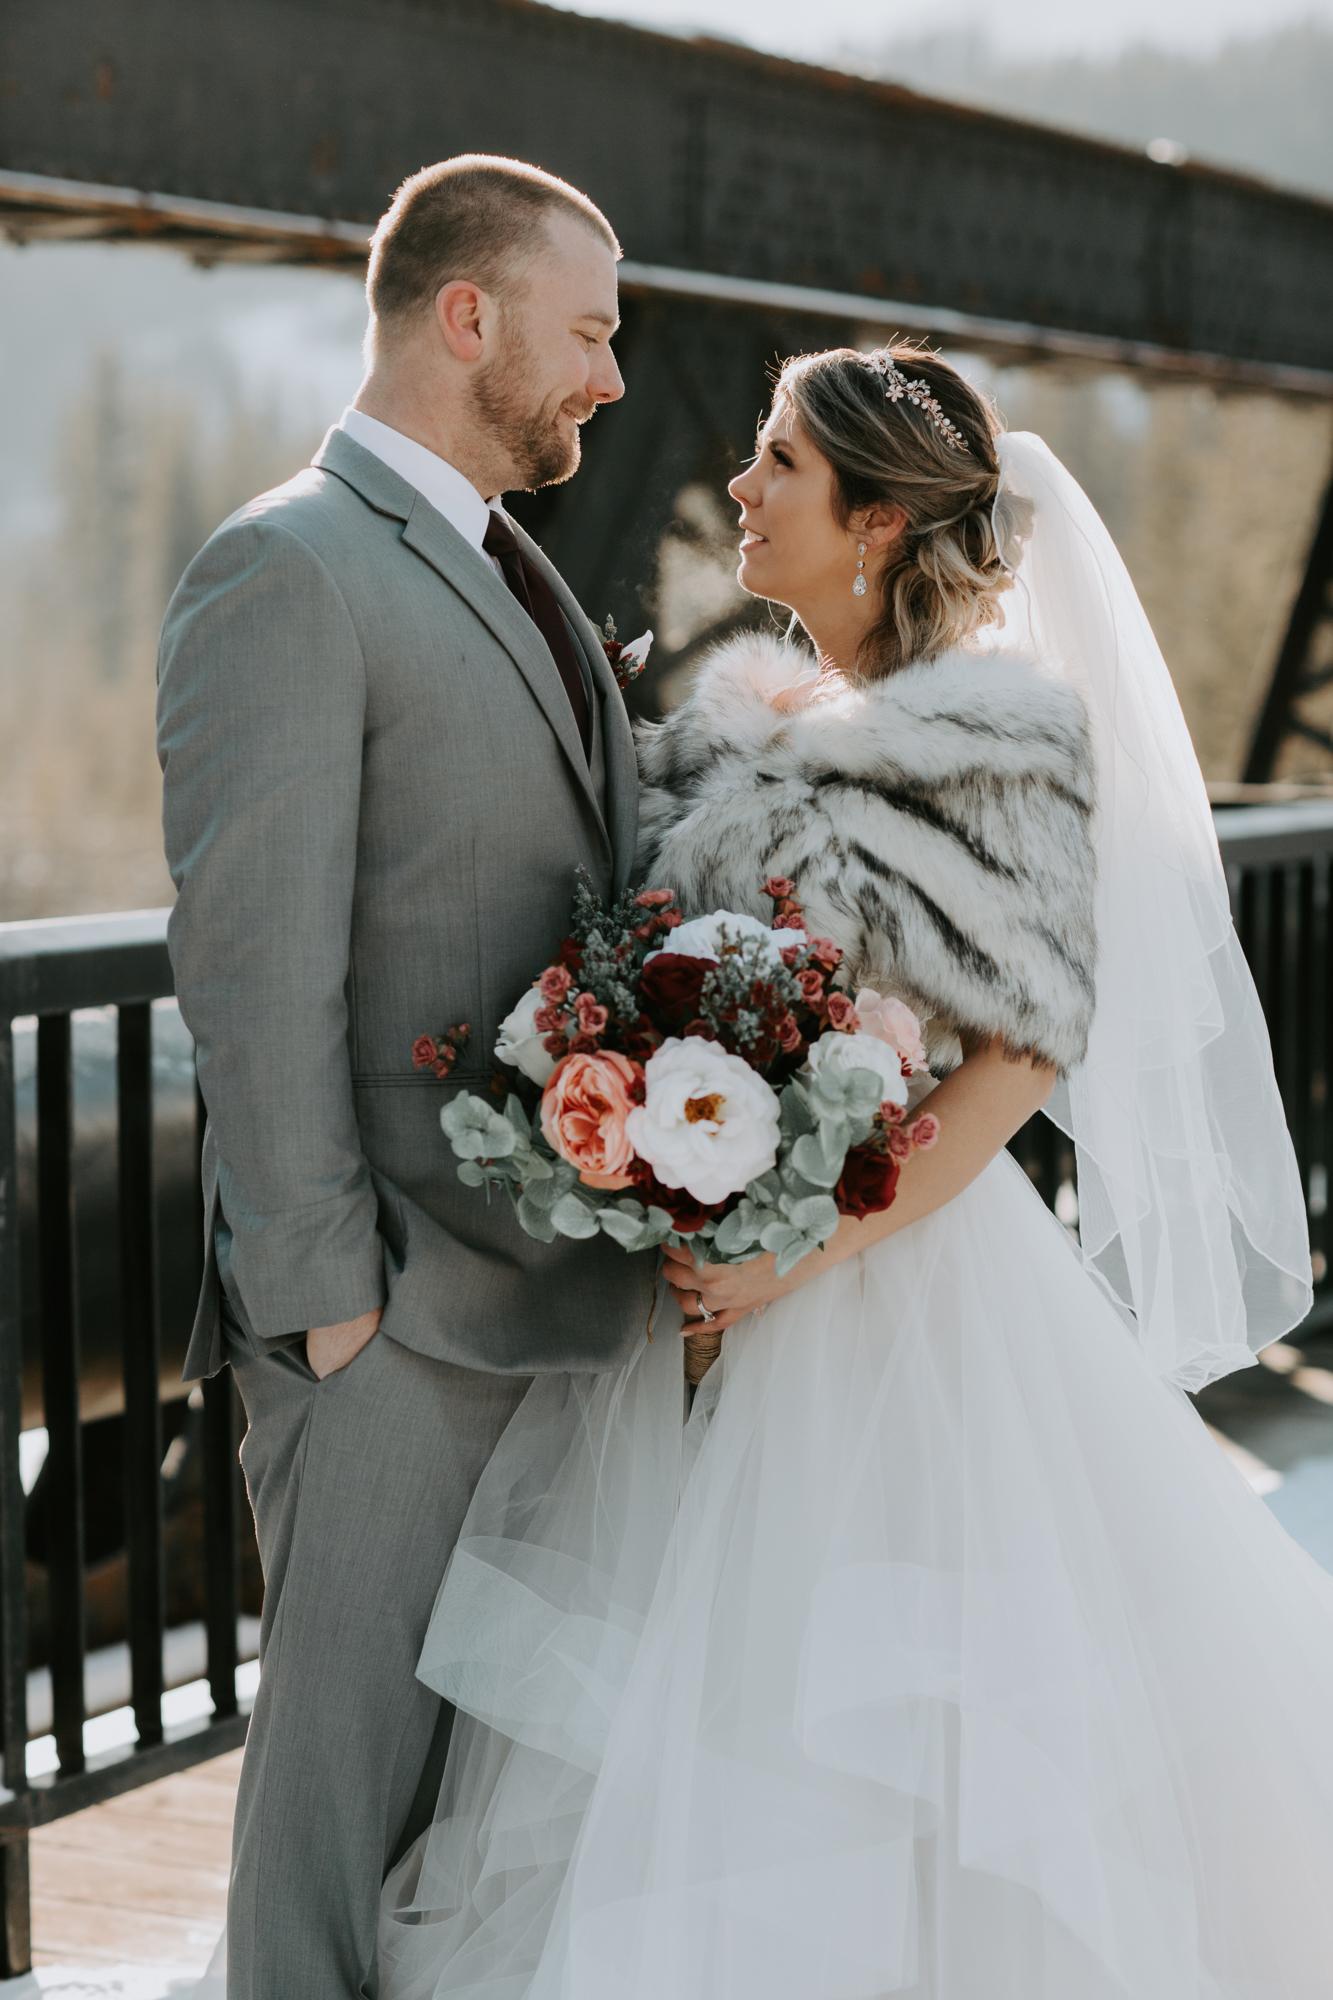 Stewart-Creek-Wedding-AJ-52.jpg